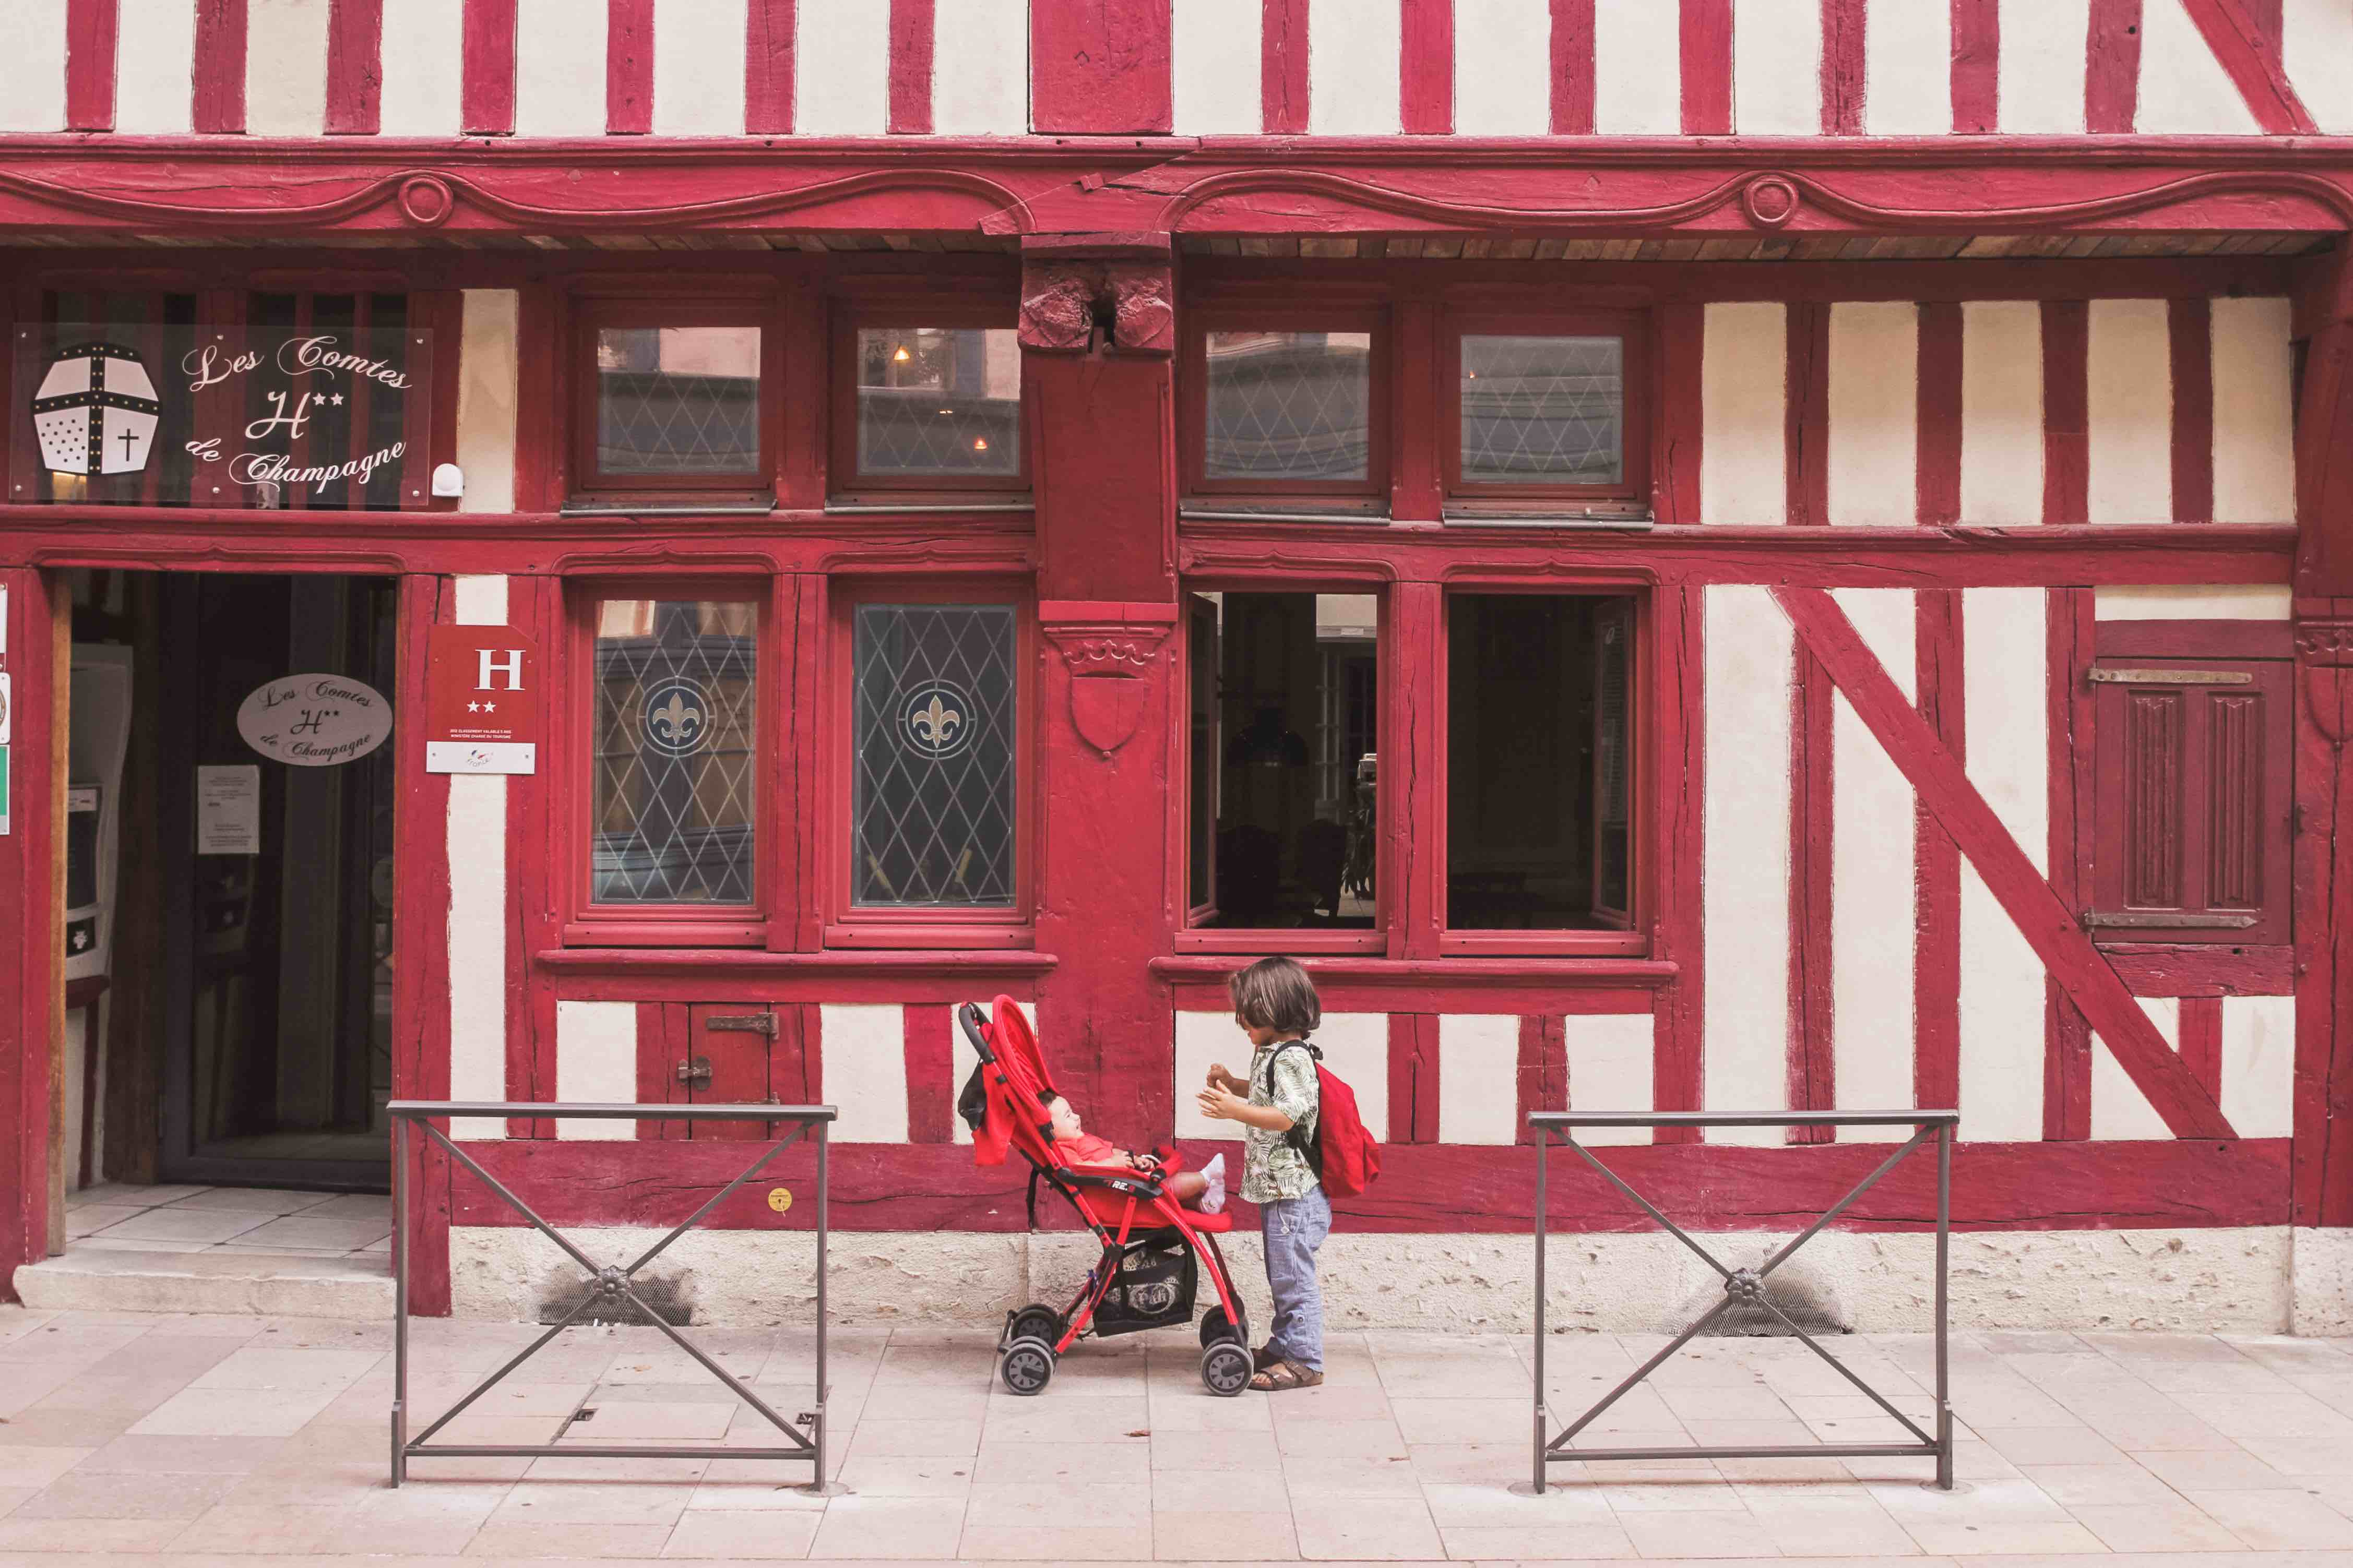 Dall'Italia all'Olanda in macchina: tappa a Troyes